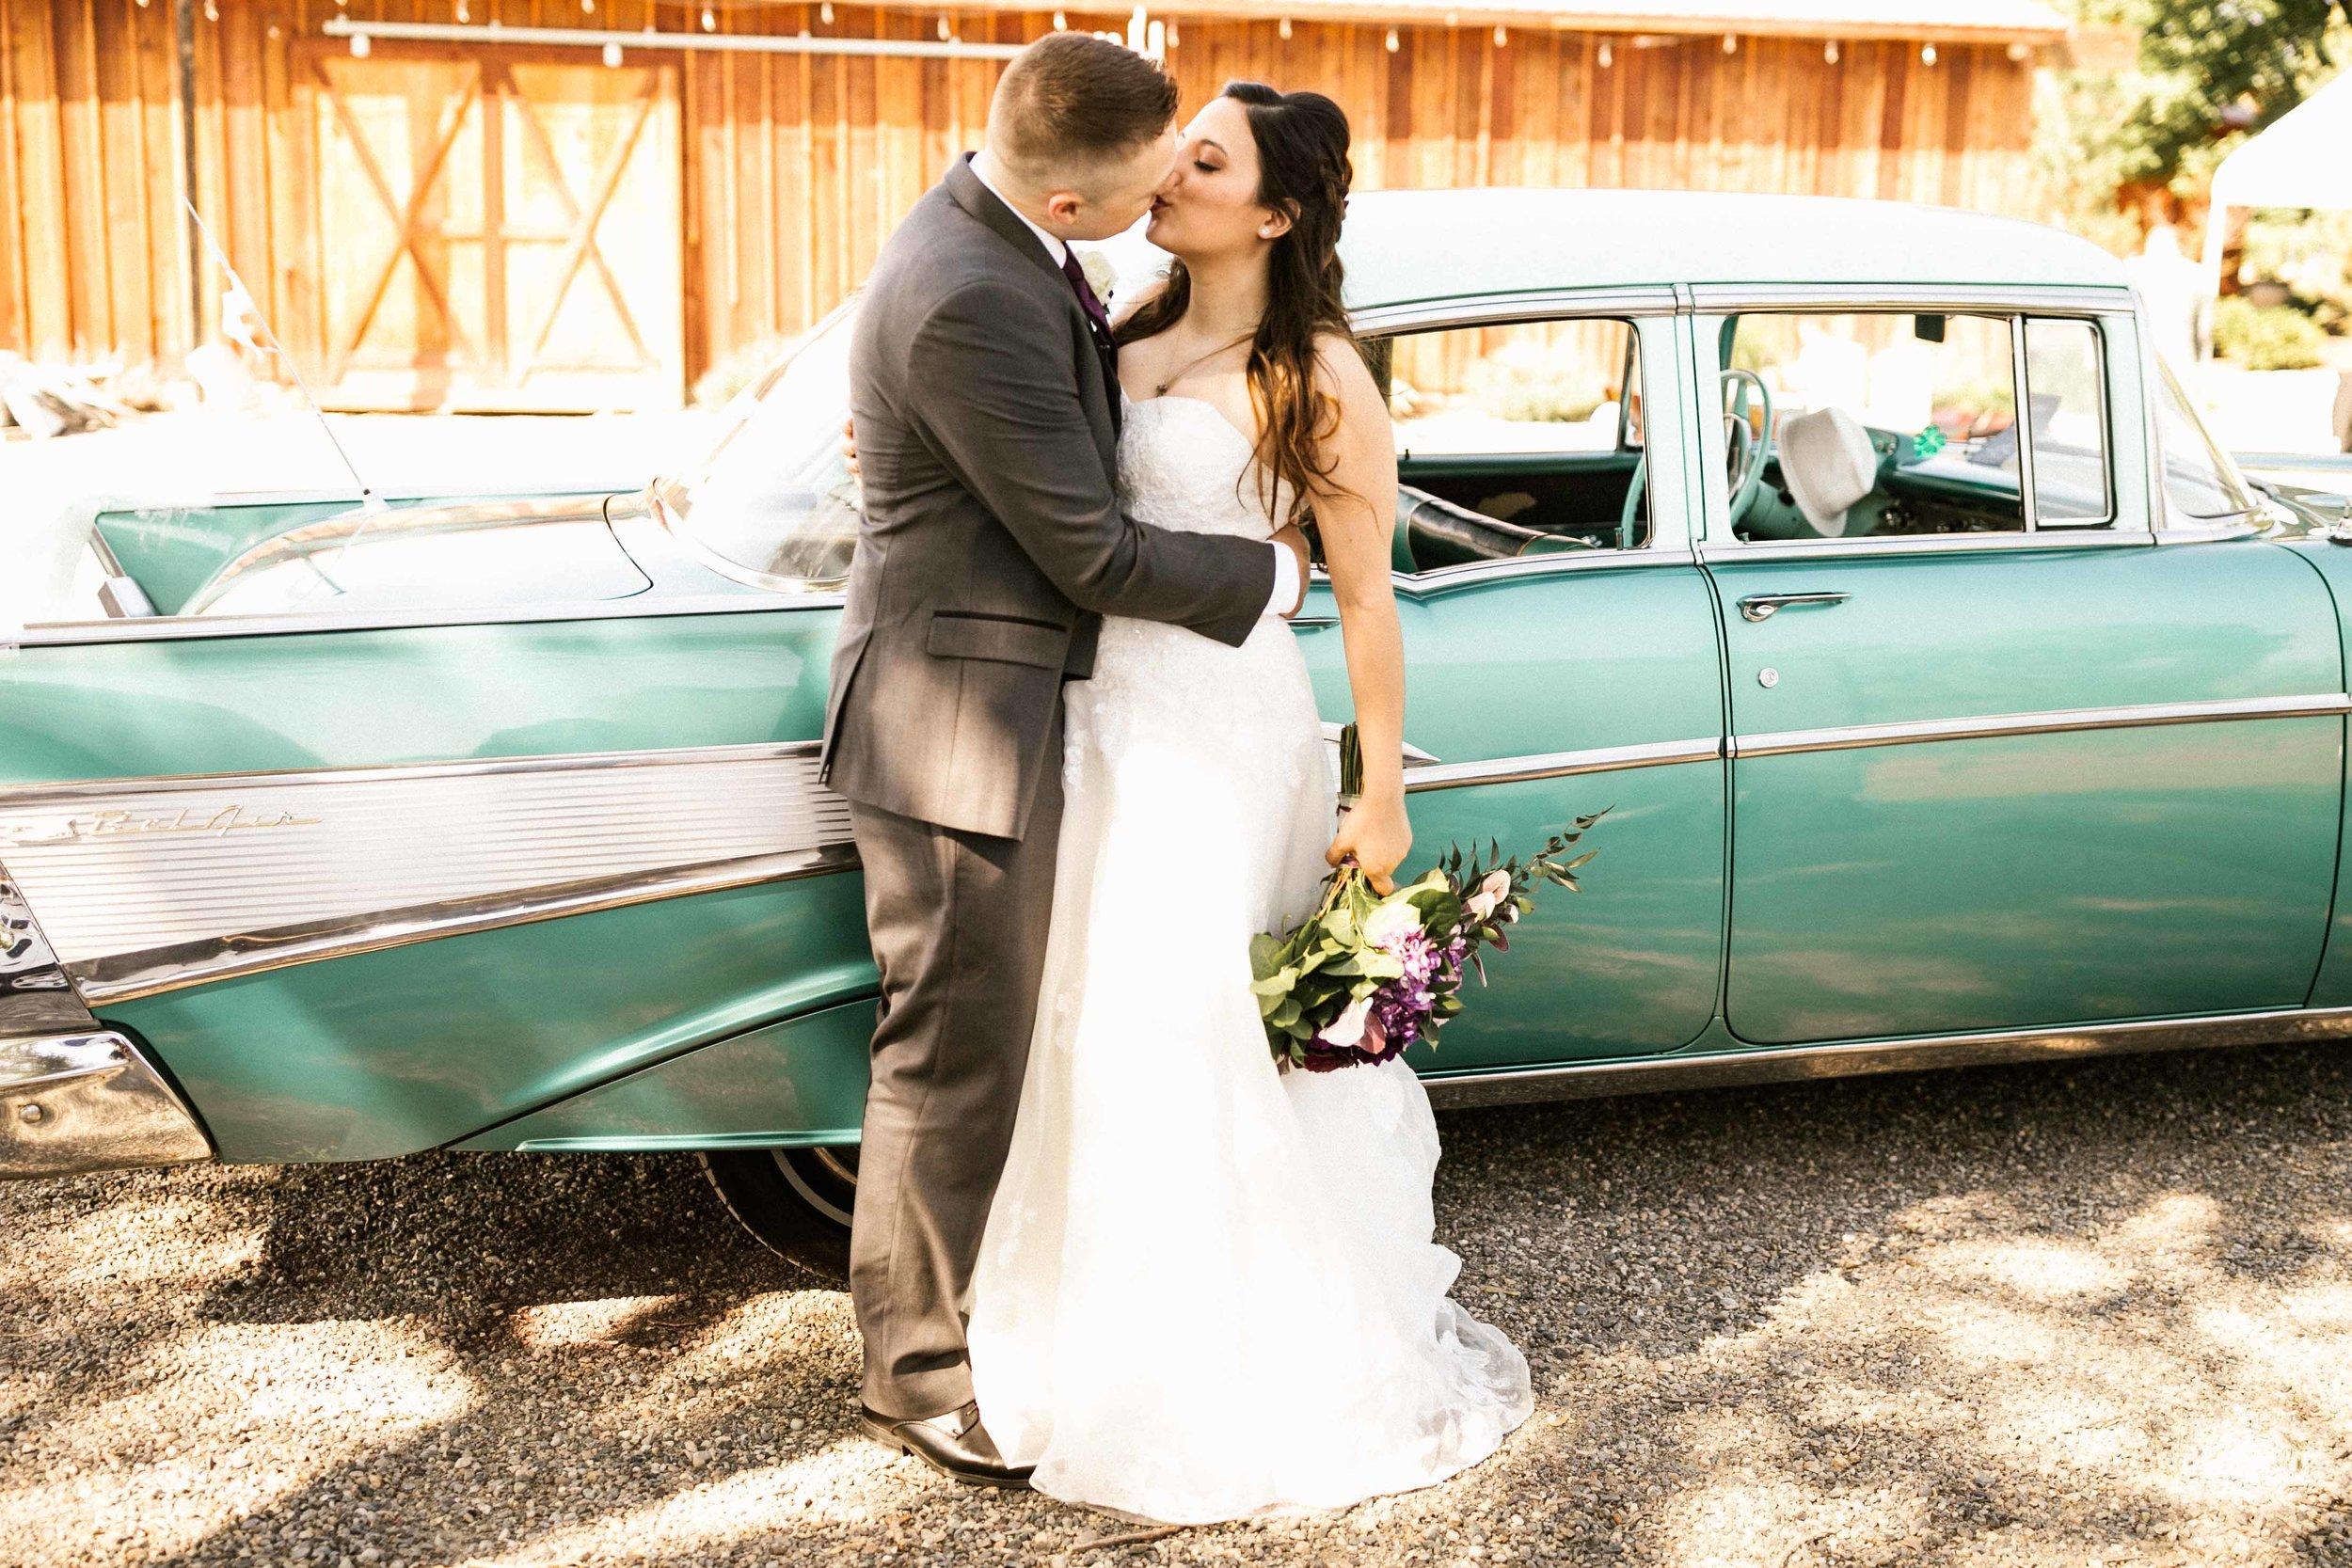 tuncannon-cellars-wedding-52.jpg